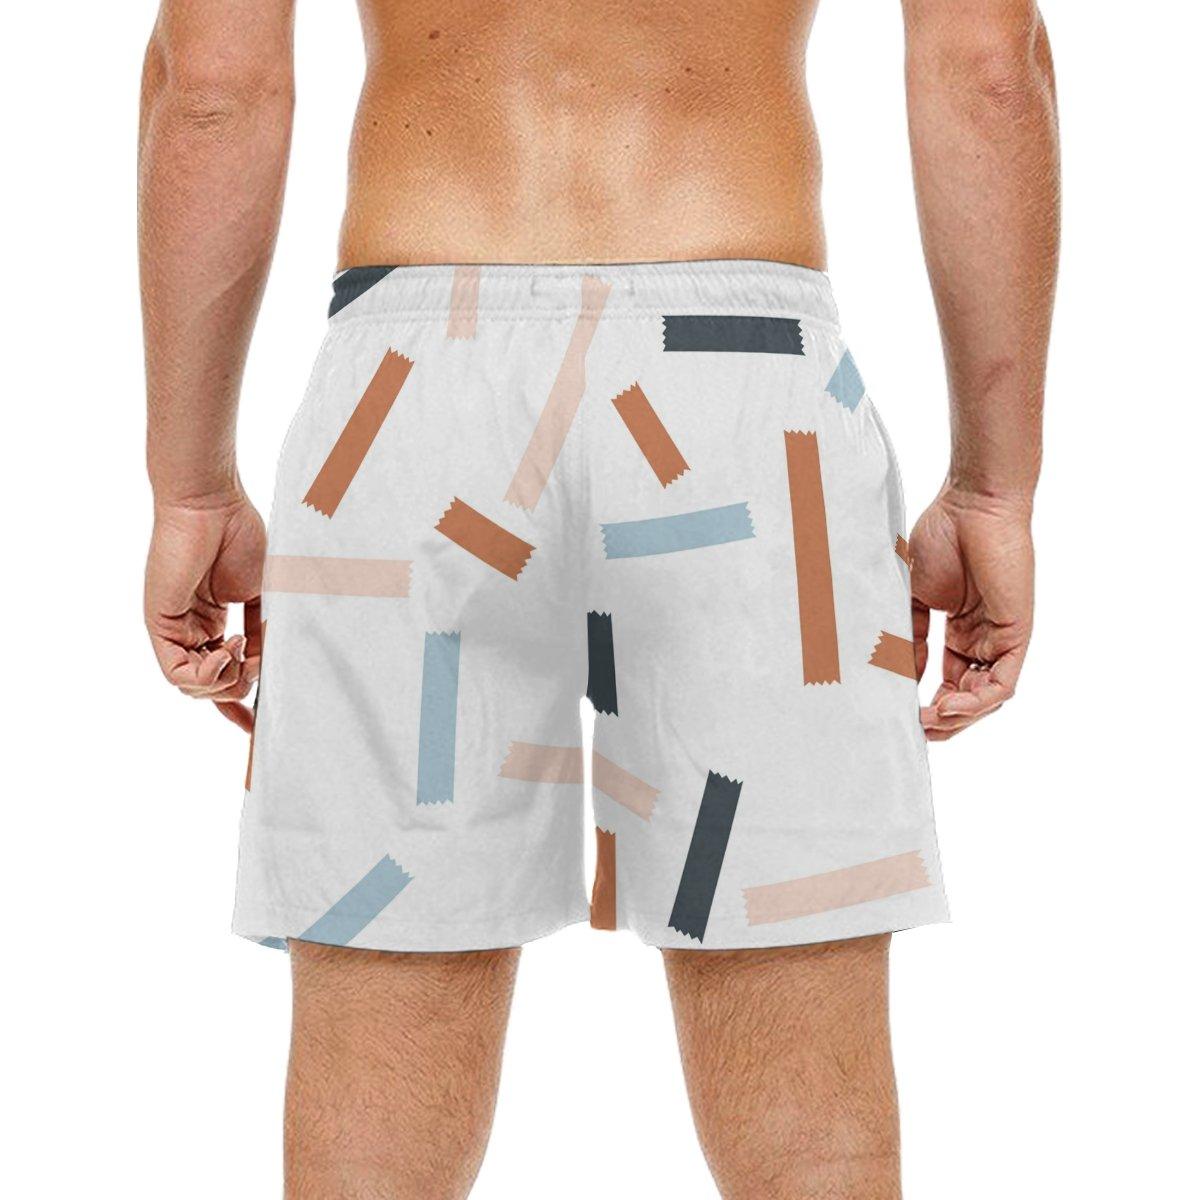 LORVIES Mens Pattern Beach Board Shorts Quick Dry Swim Trunk